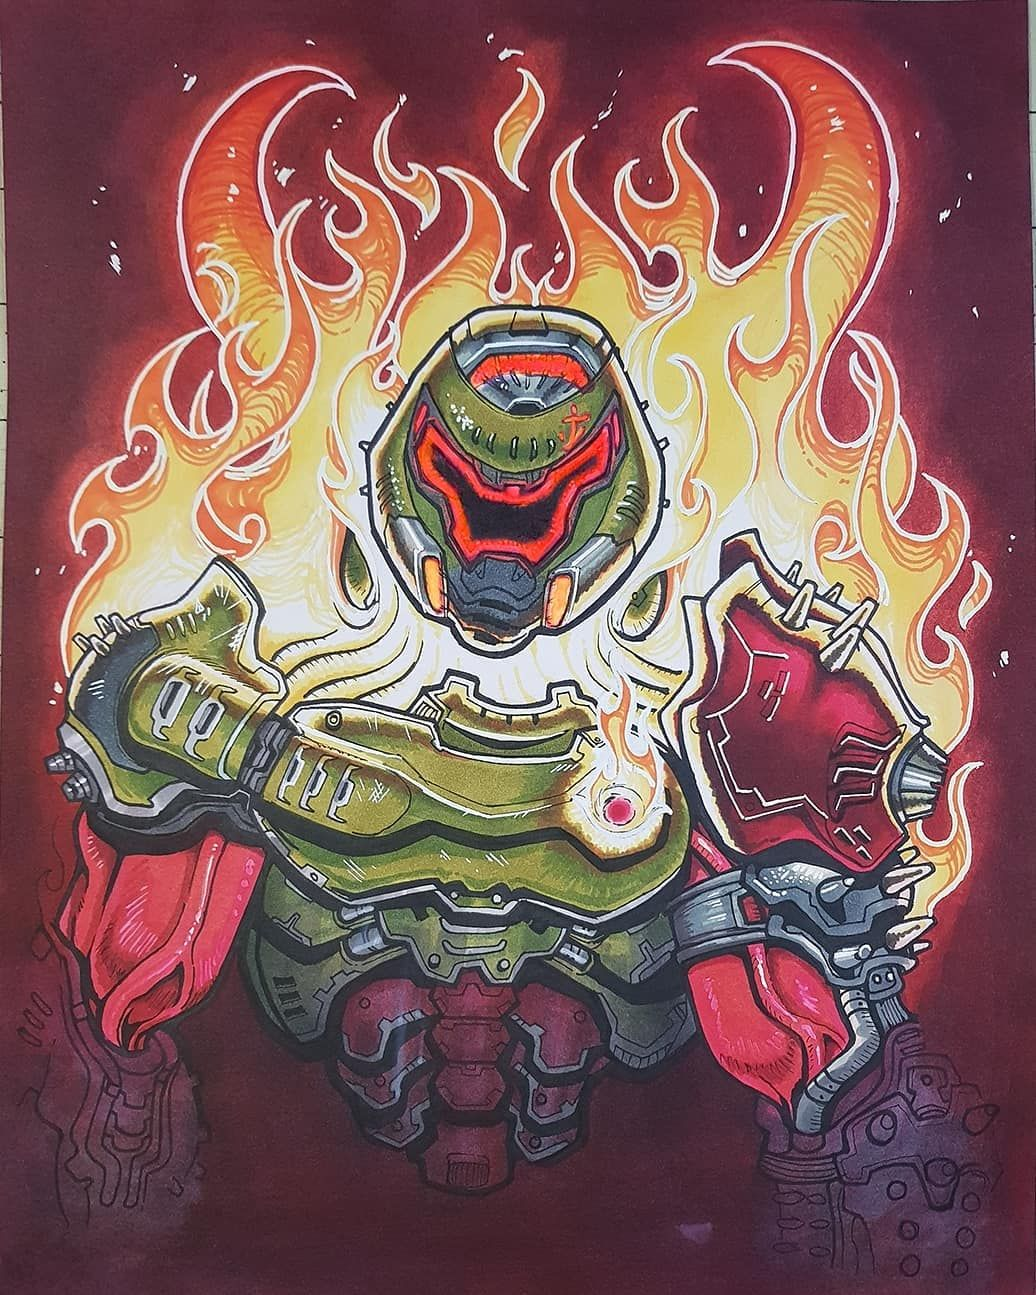 Doom Community On Instagram The Demonic Slayer Awesome Art By U